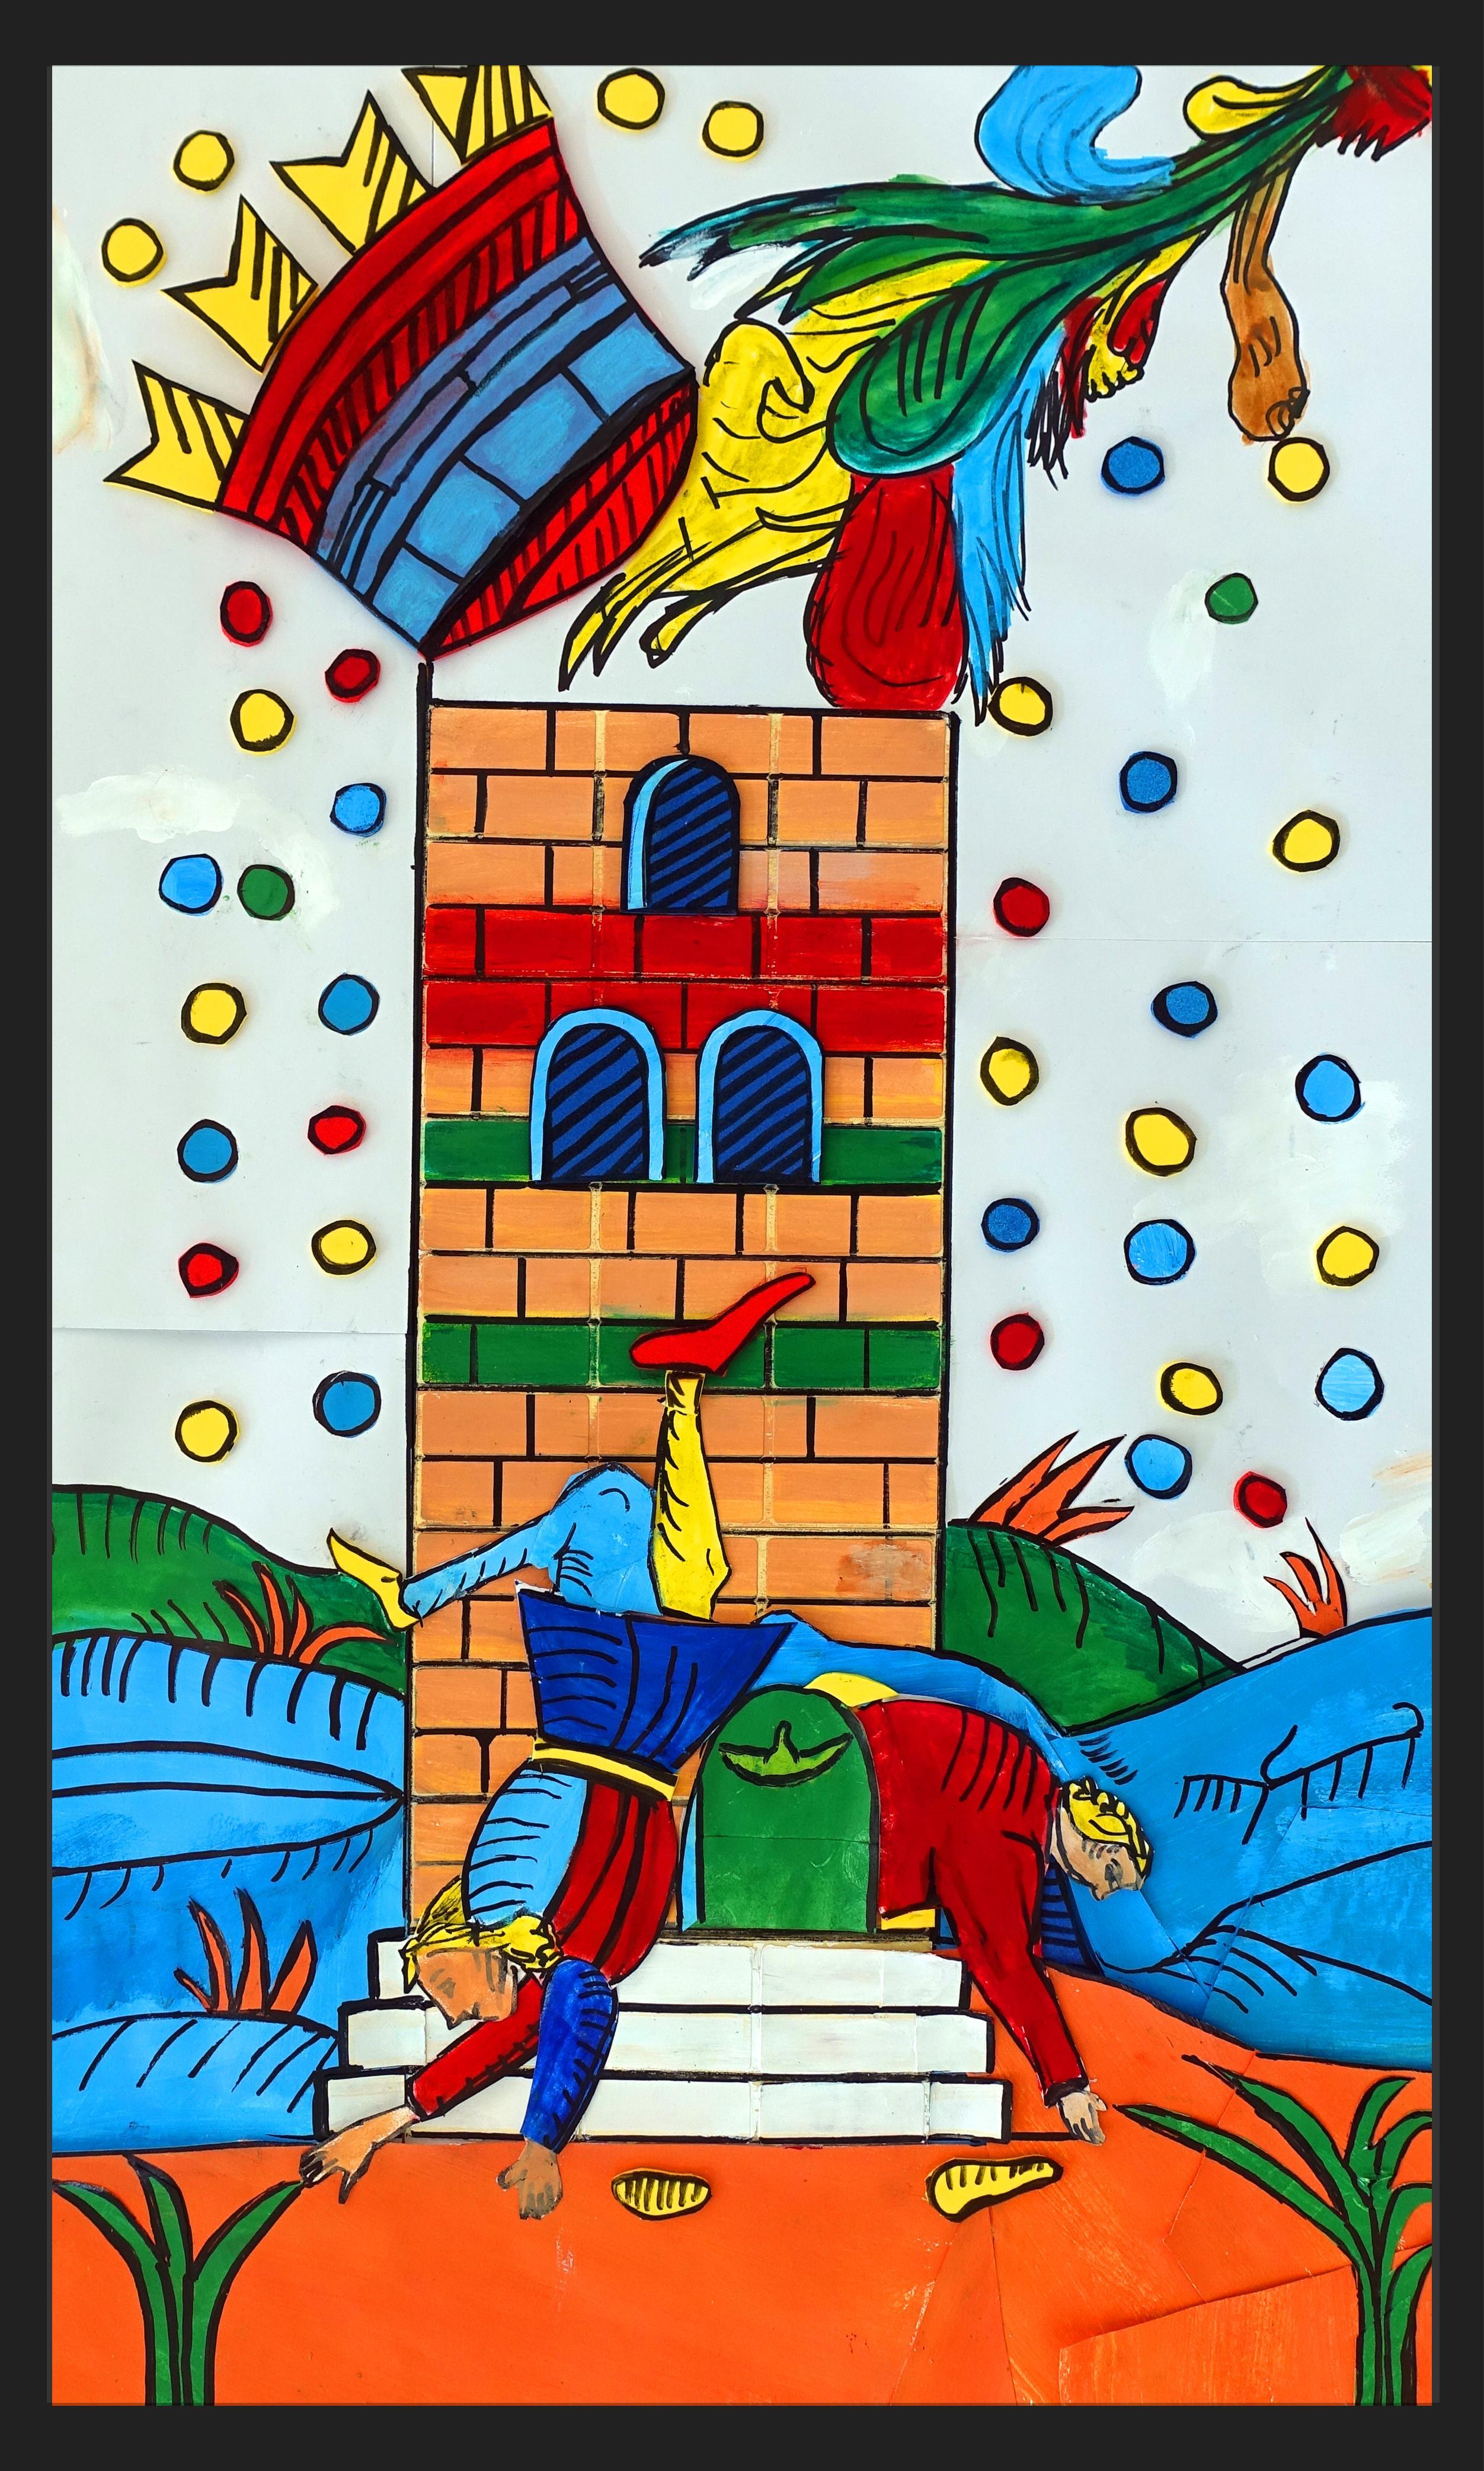 La Torre XVI, leyla rodriguez, waldhorn, supreme presence, optimistic cover, BOOM